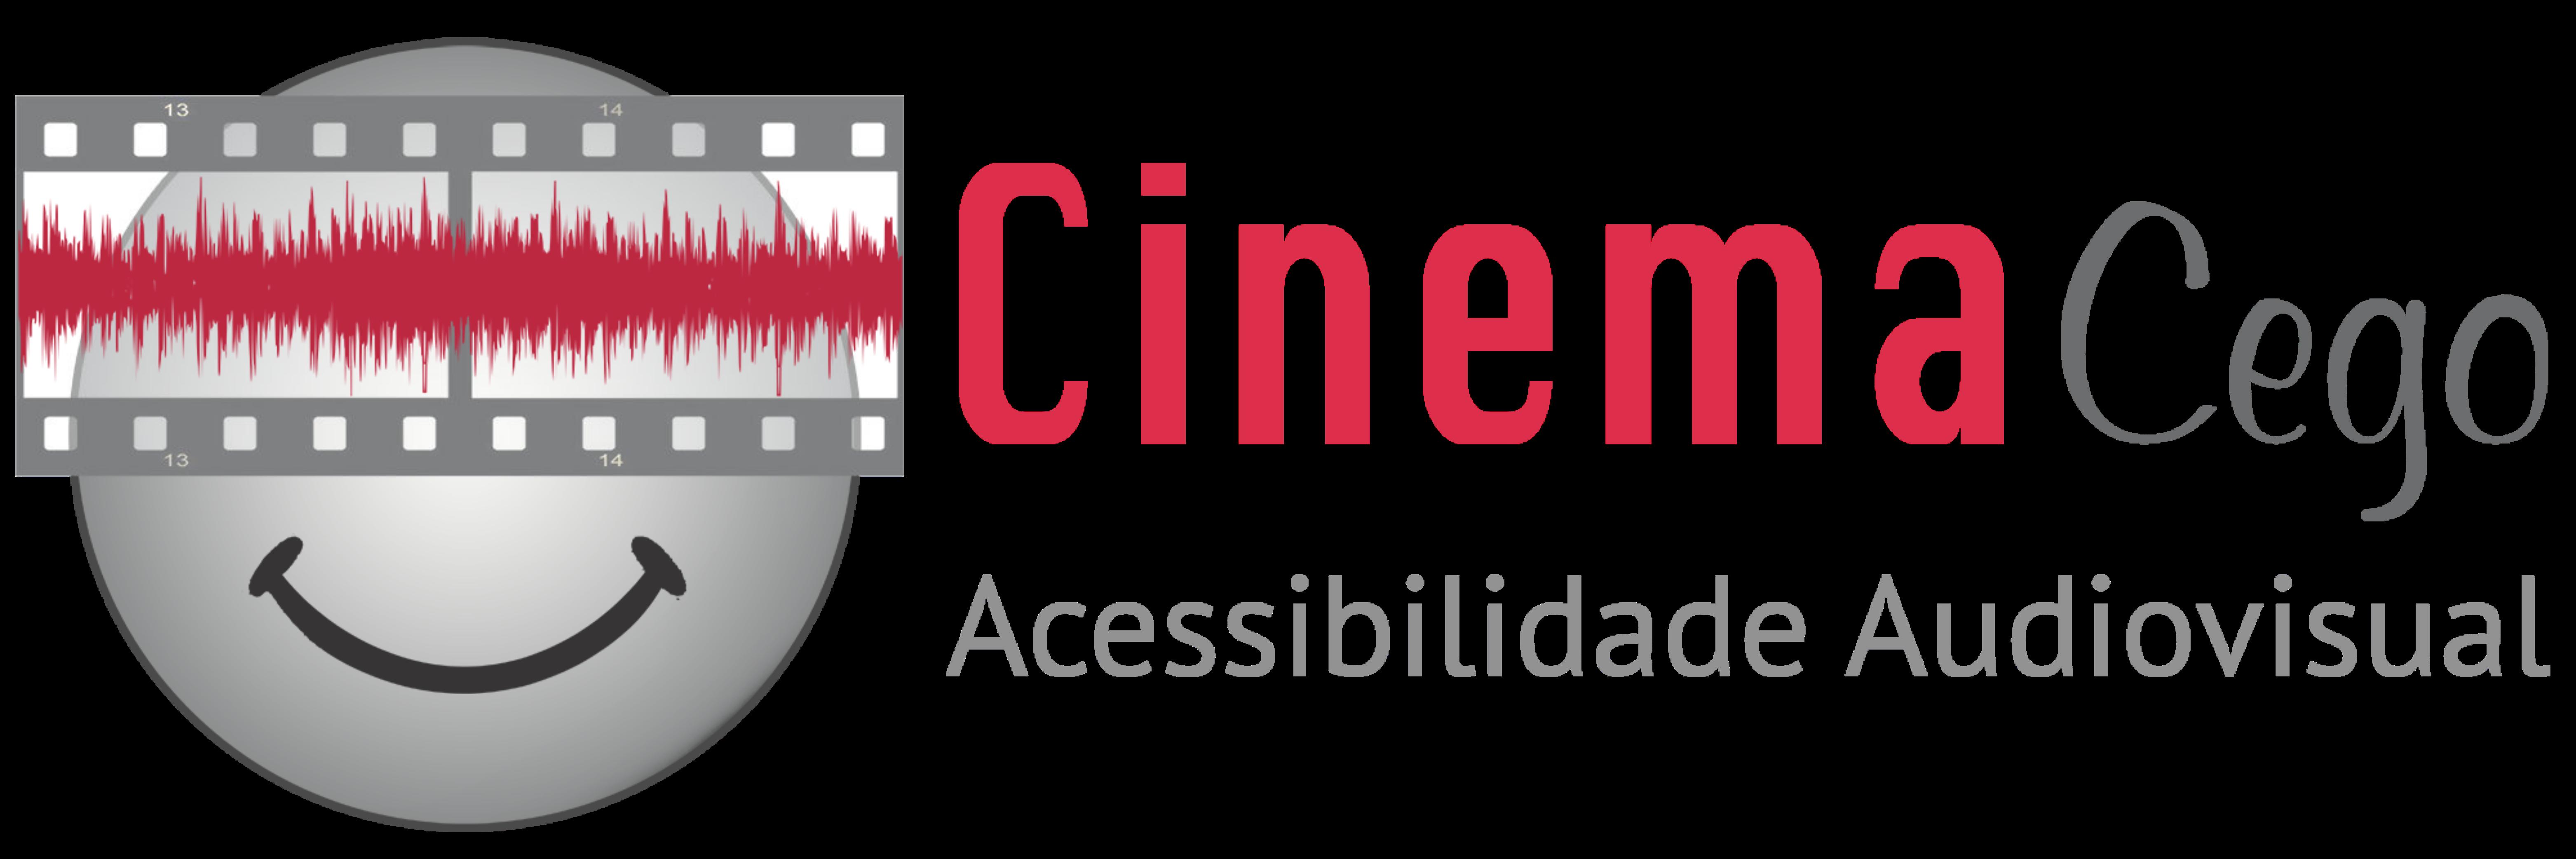 Cinema Cego